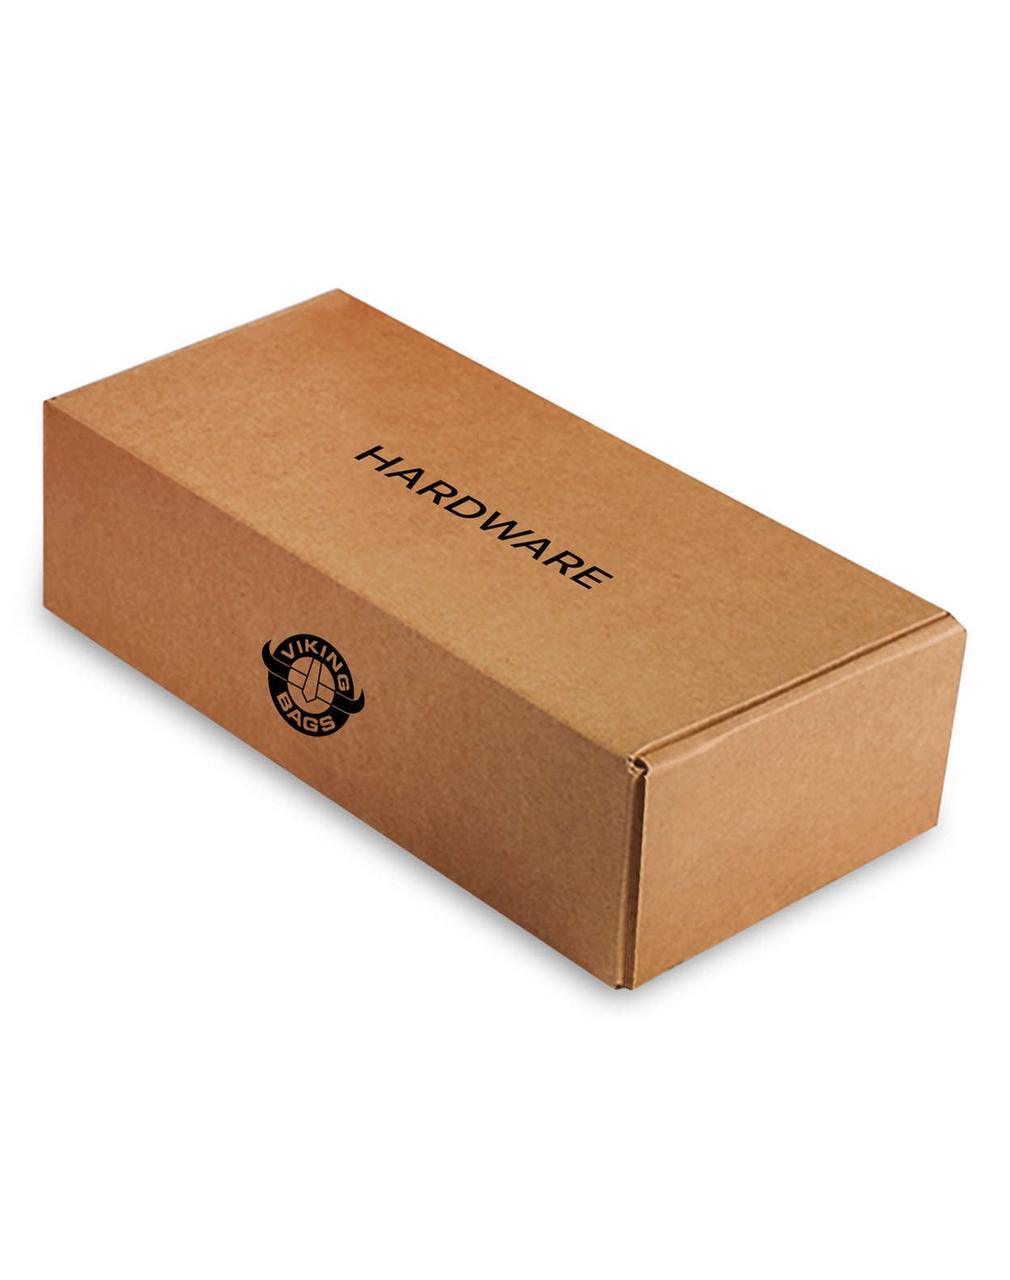 Triumph Rocket III Range Warrior Slanted Medium Motorcycle Saddlebags Box